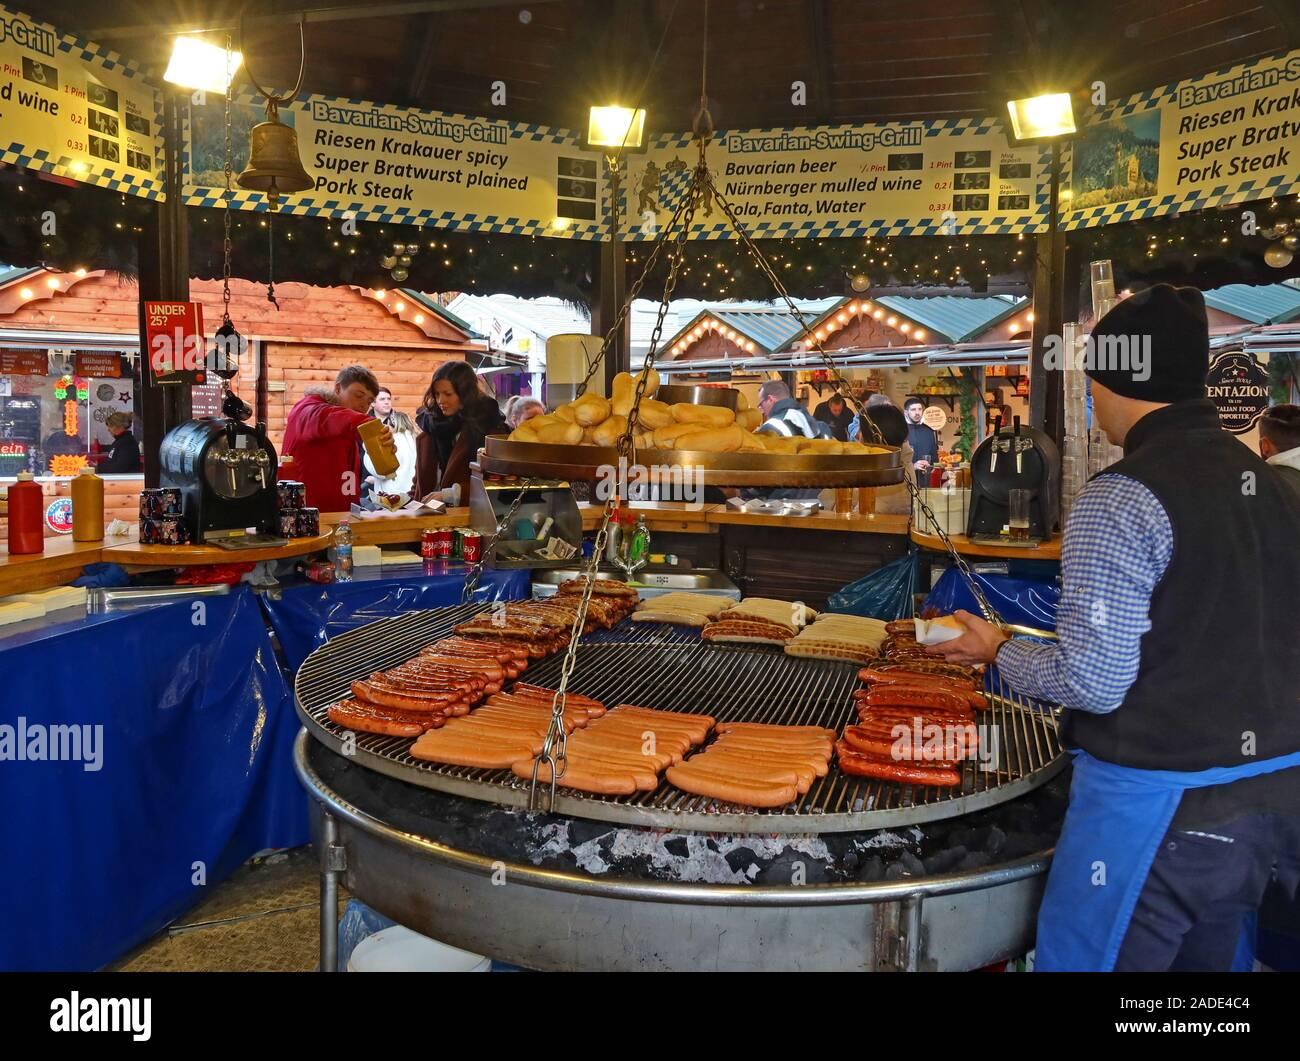 GoTonySmith,HotpixUK,@HotpixUK,Wurst,grilling over charcoals,German market,Albert Square,Manchester,England,UK,Xmas,Christmas,Market,food,BBQ,swing,hotdog,hotdogs,Pork Steak,Riesen,Krakauer,mulled wine,Bavarian cuisine,Bavarian,cuisine